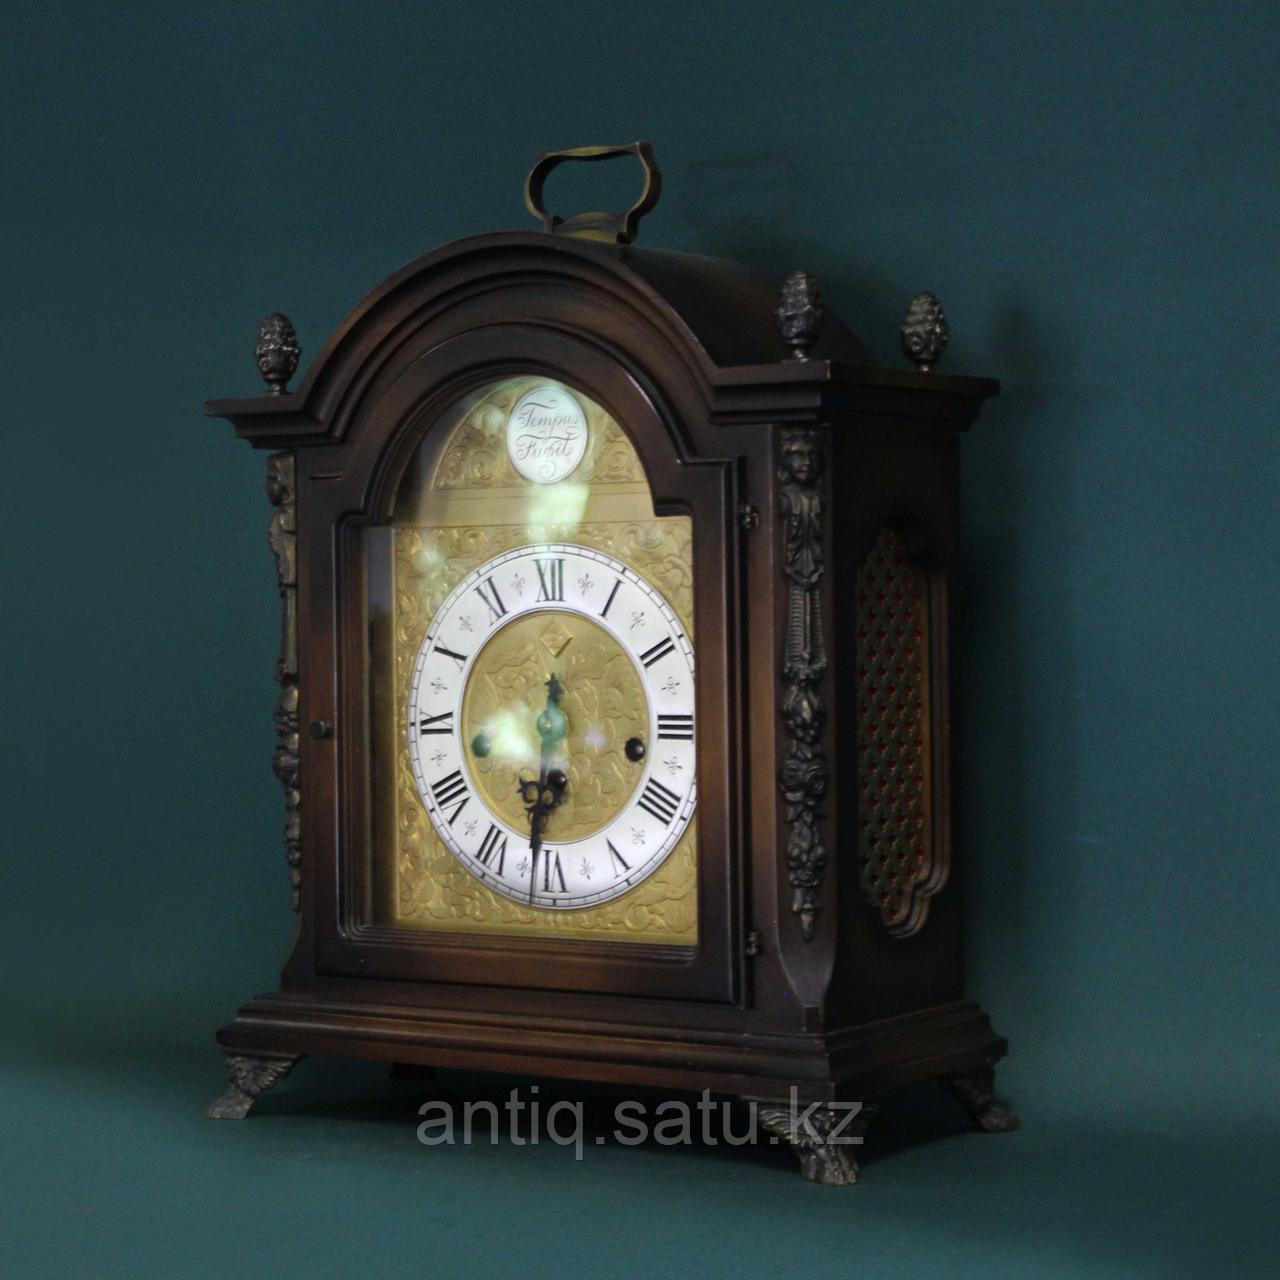 Настольные часы Часовая мастерская Emil Schmeckenbecher - фото 2